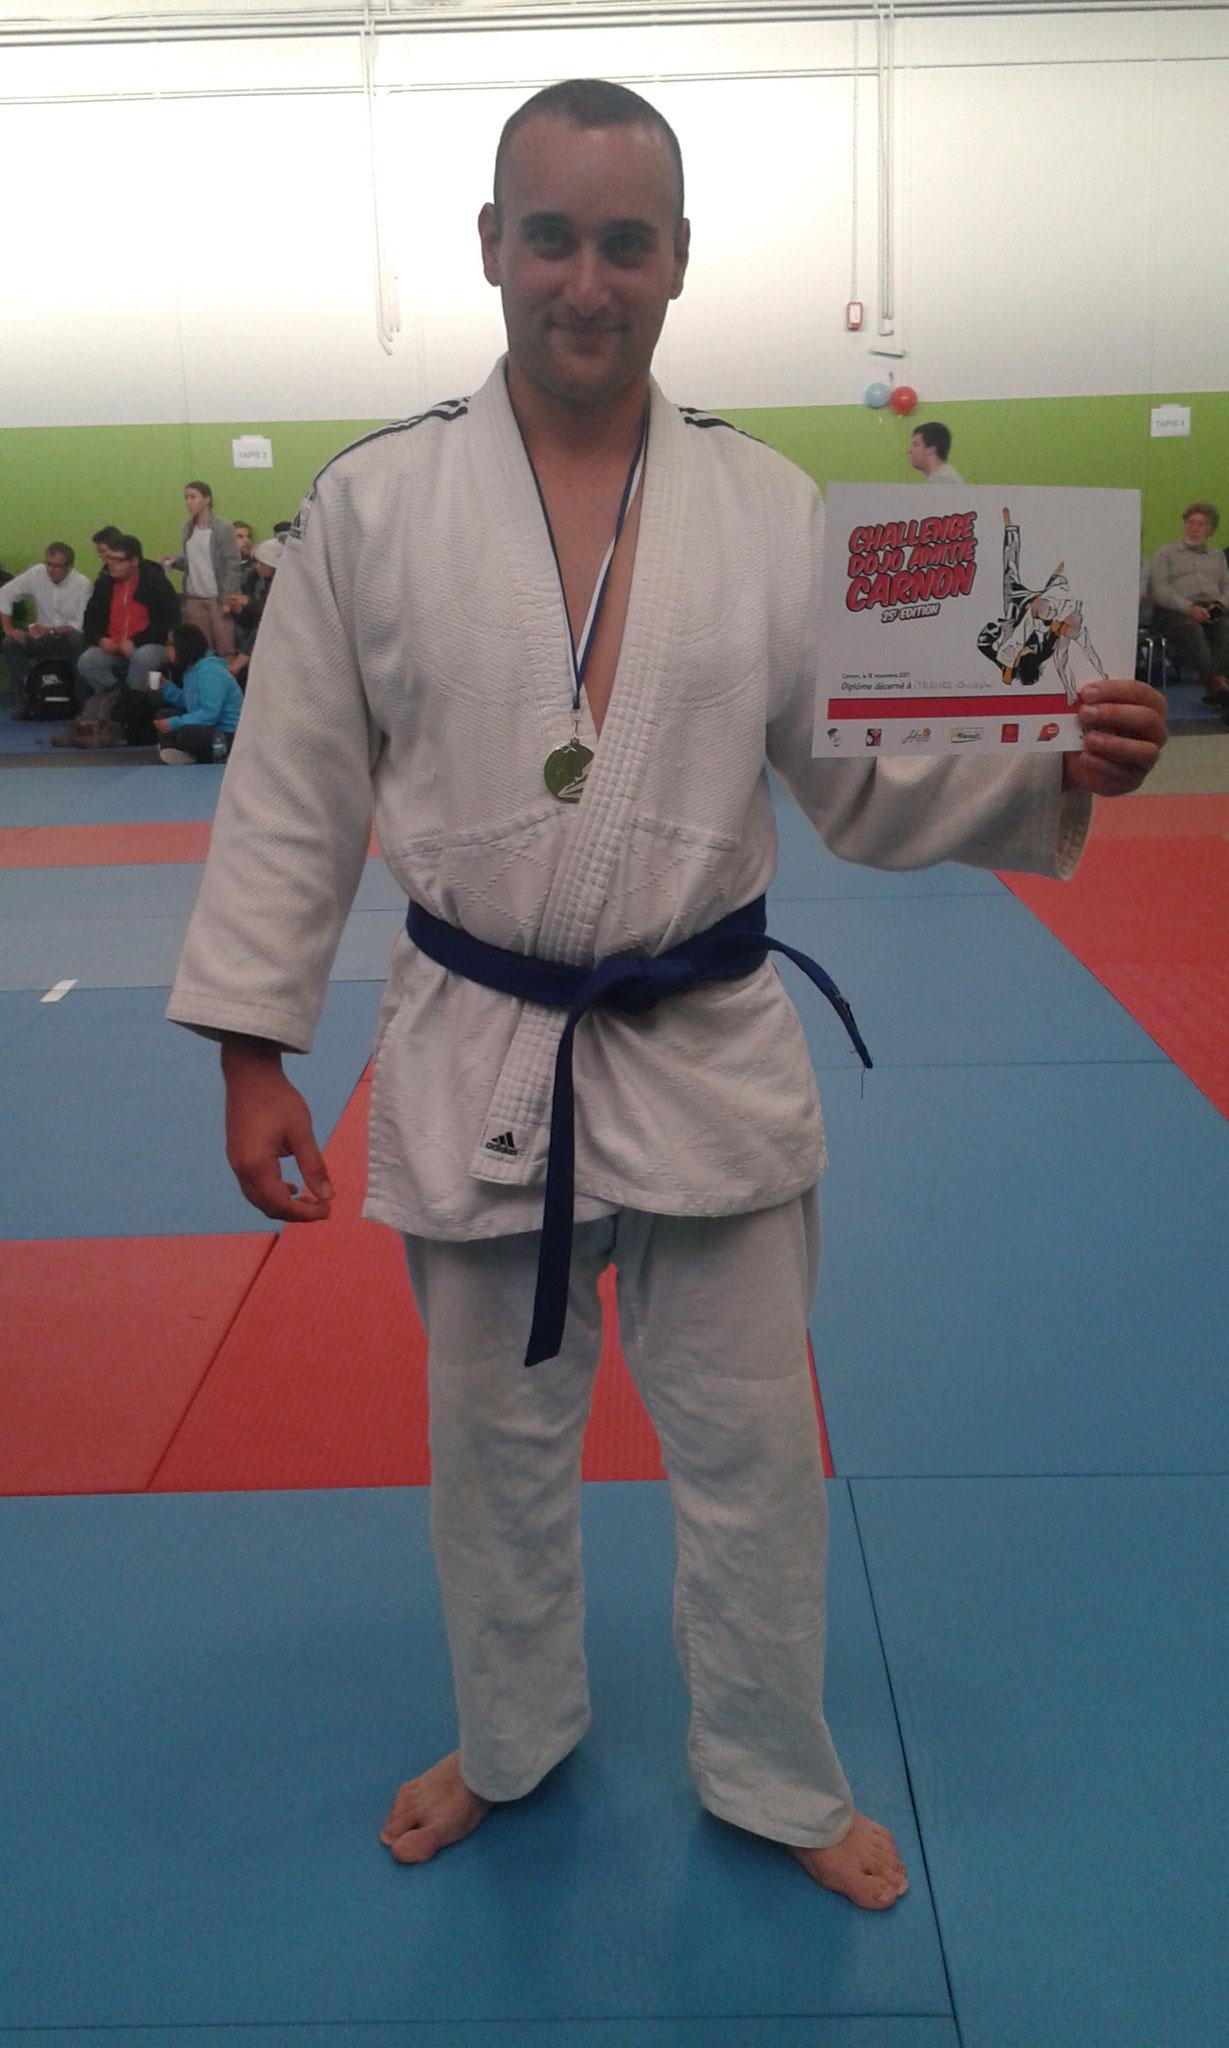 Championnat Interrégional Judo Occitanie,Christopher